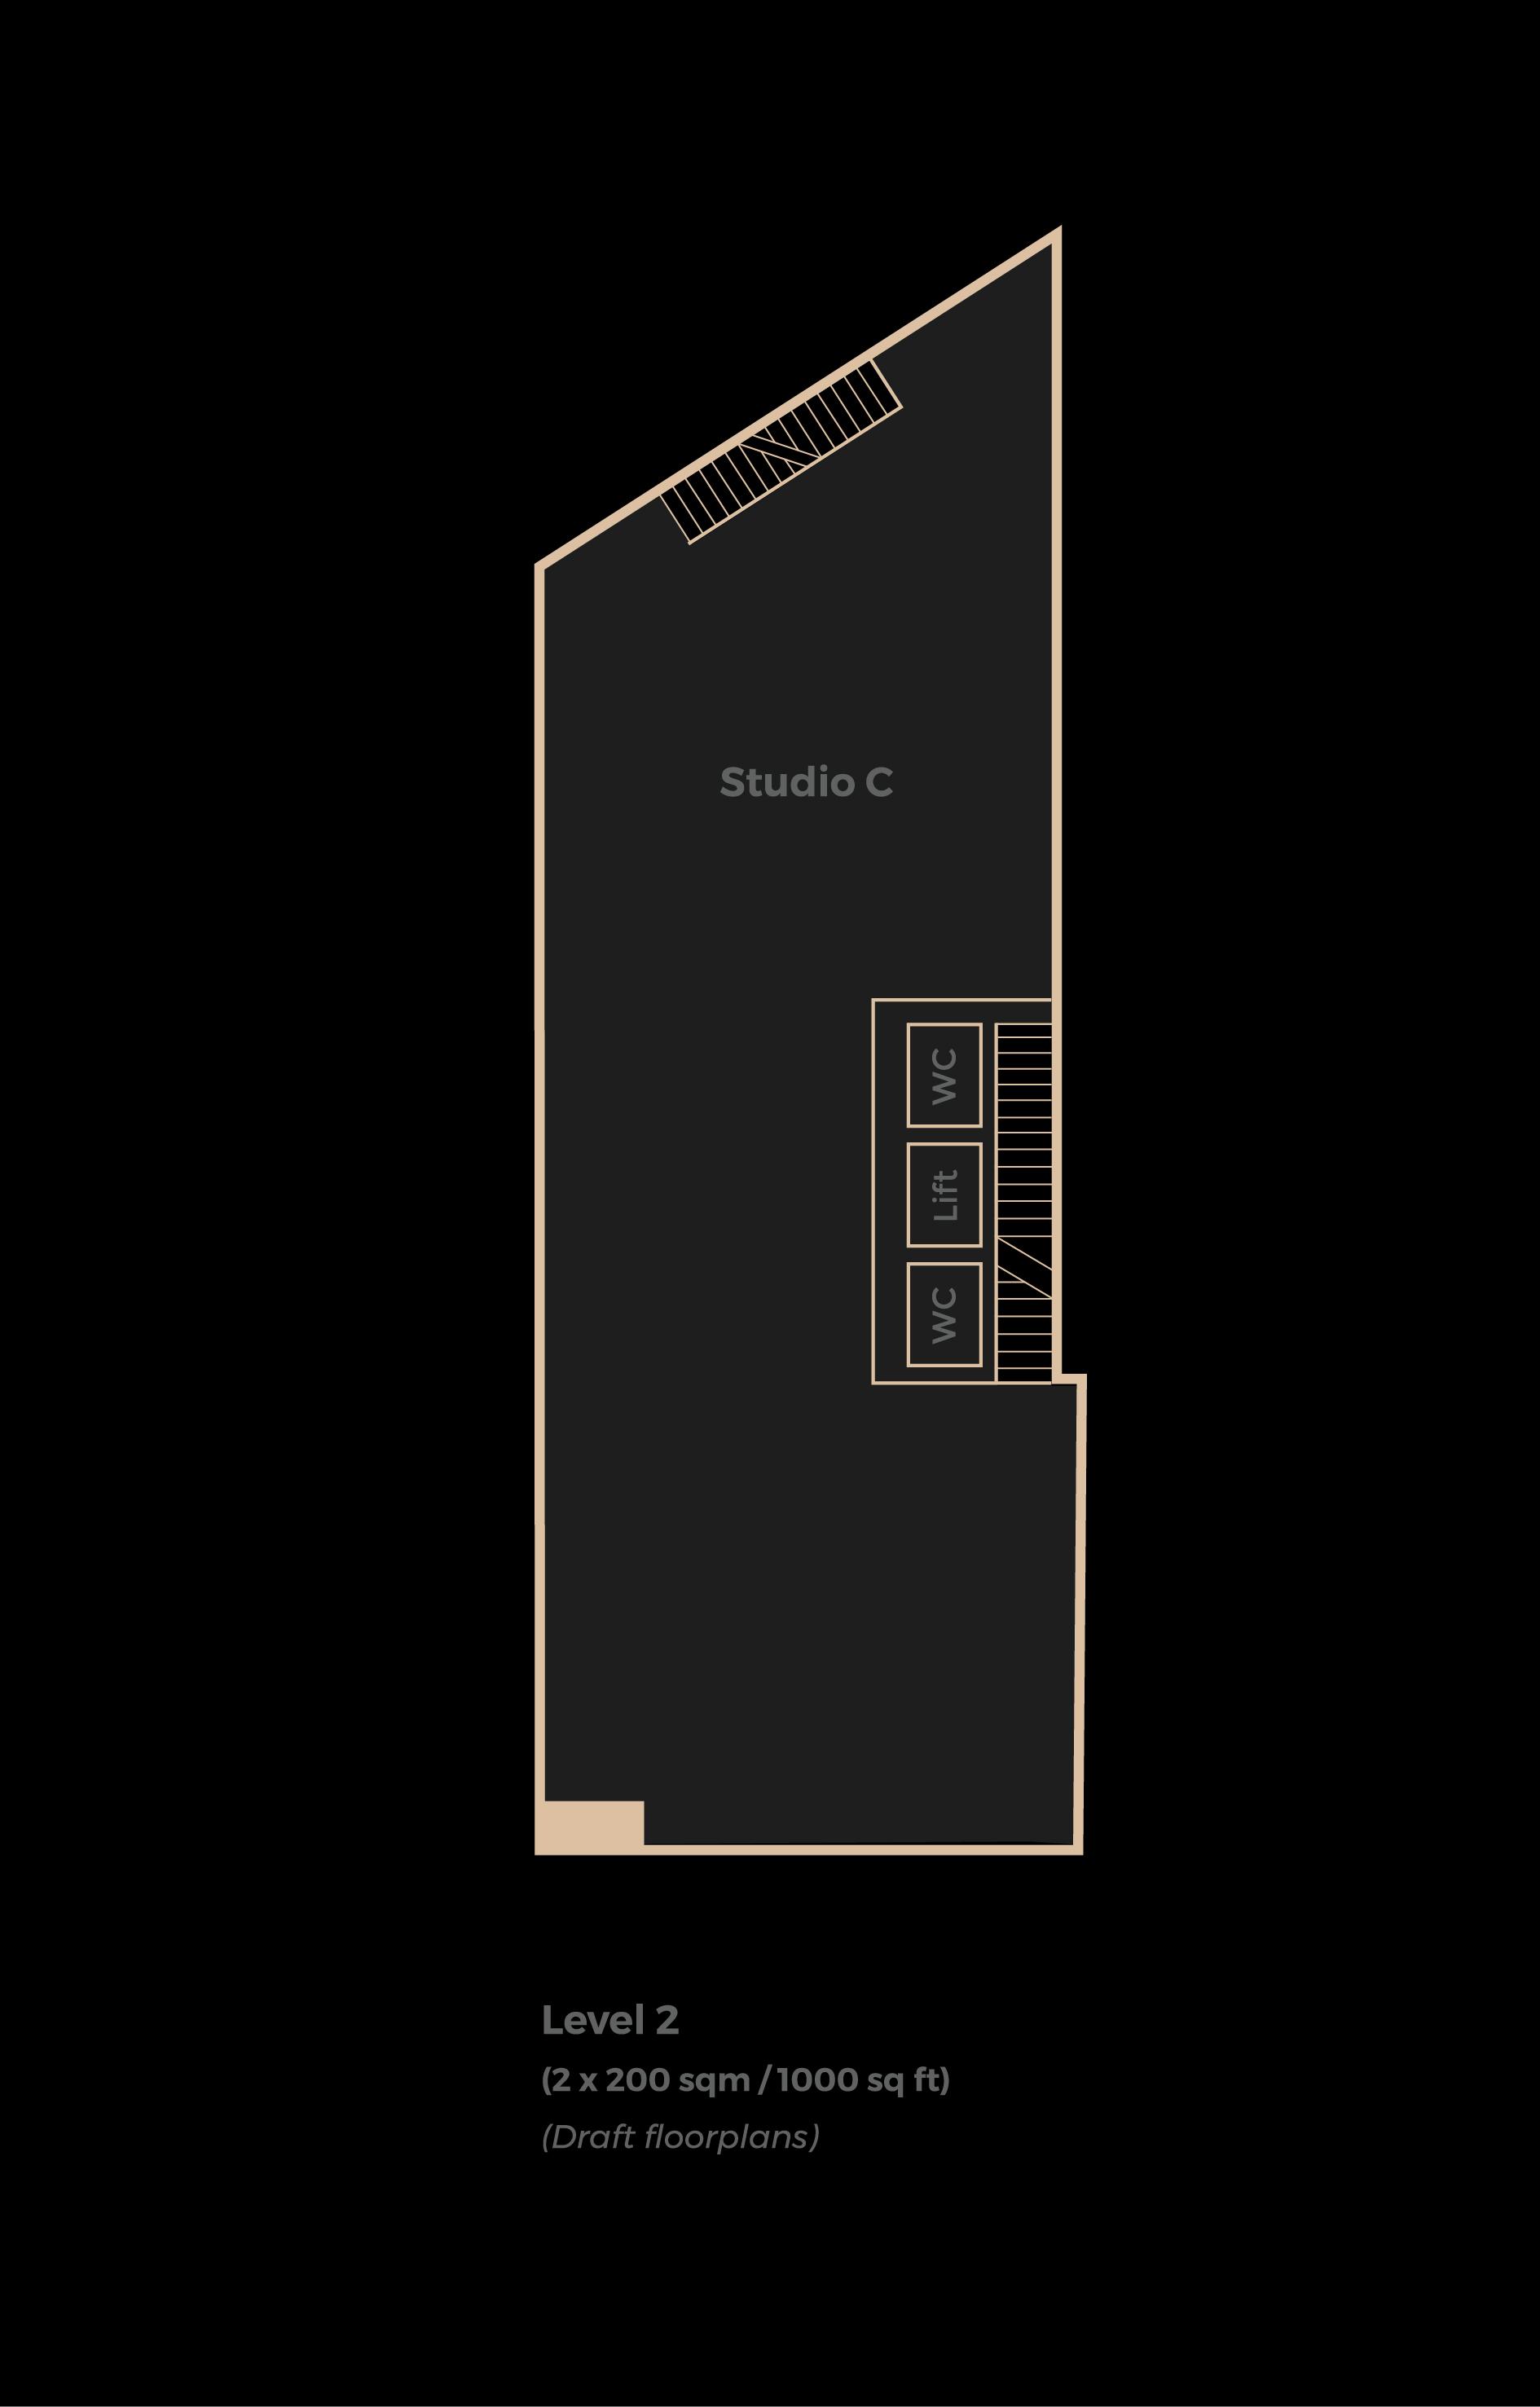 LTC001_Hat_House_Floorplans_black_outlined_V3-04.jpg